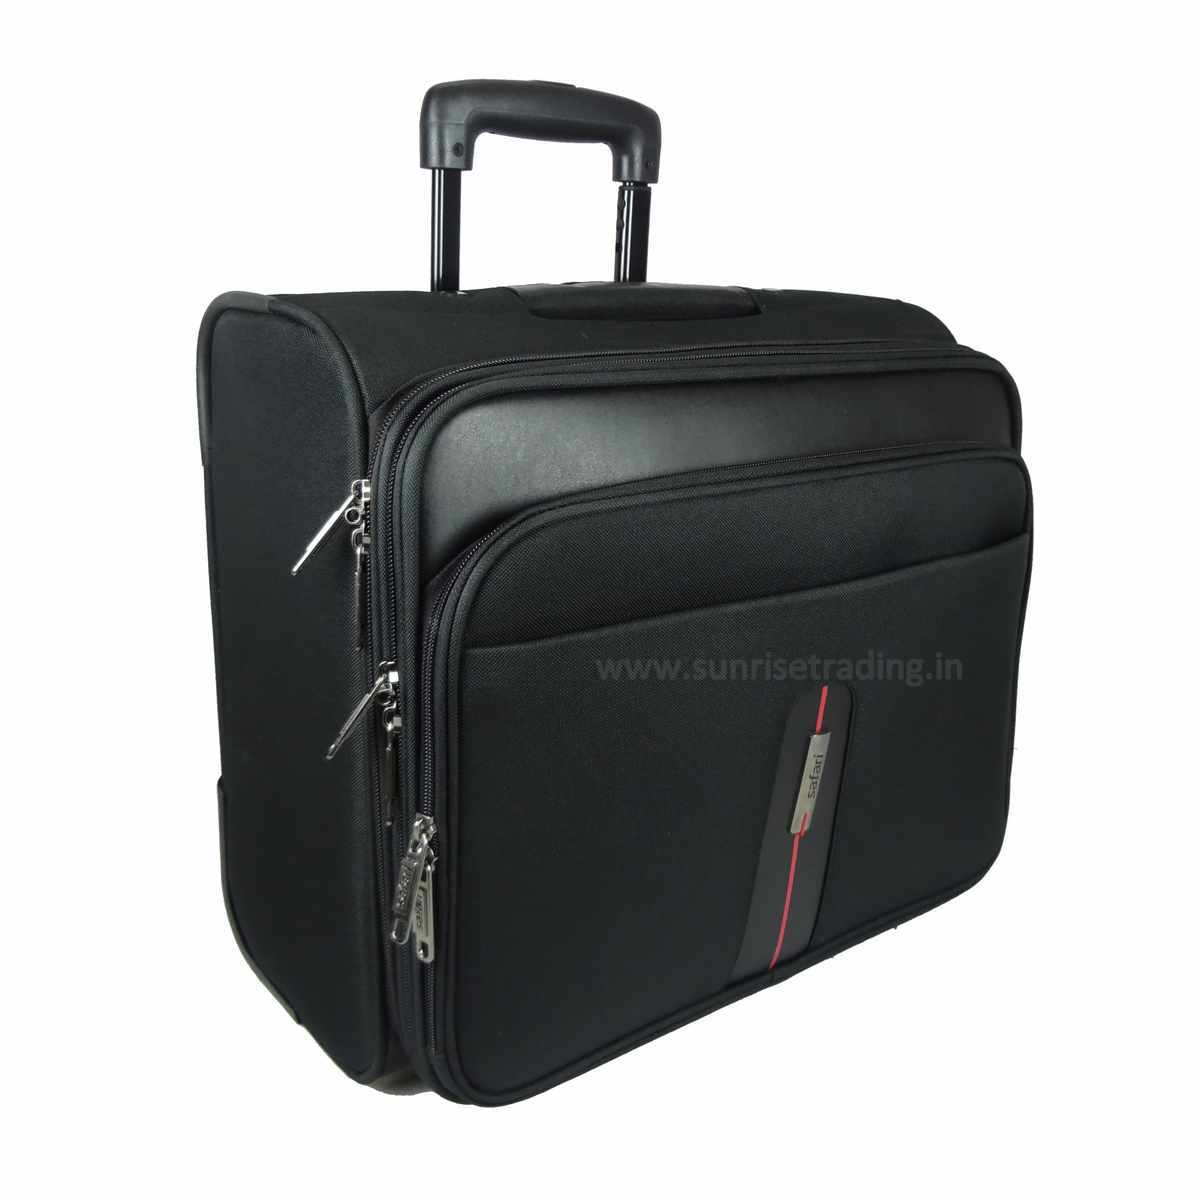 Safari Trolley Bags Online Shopping India 47749787f6fa7